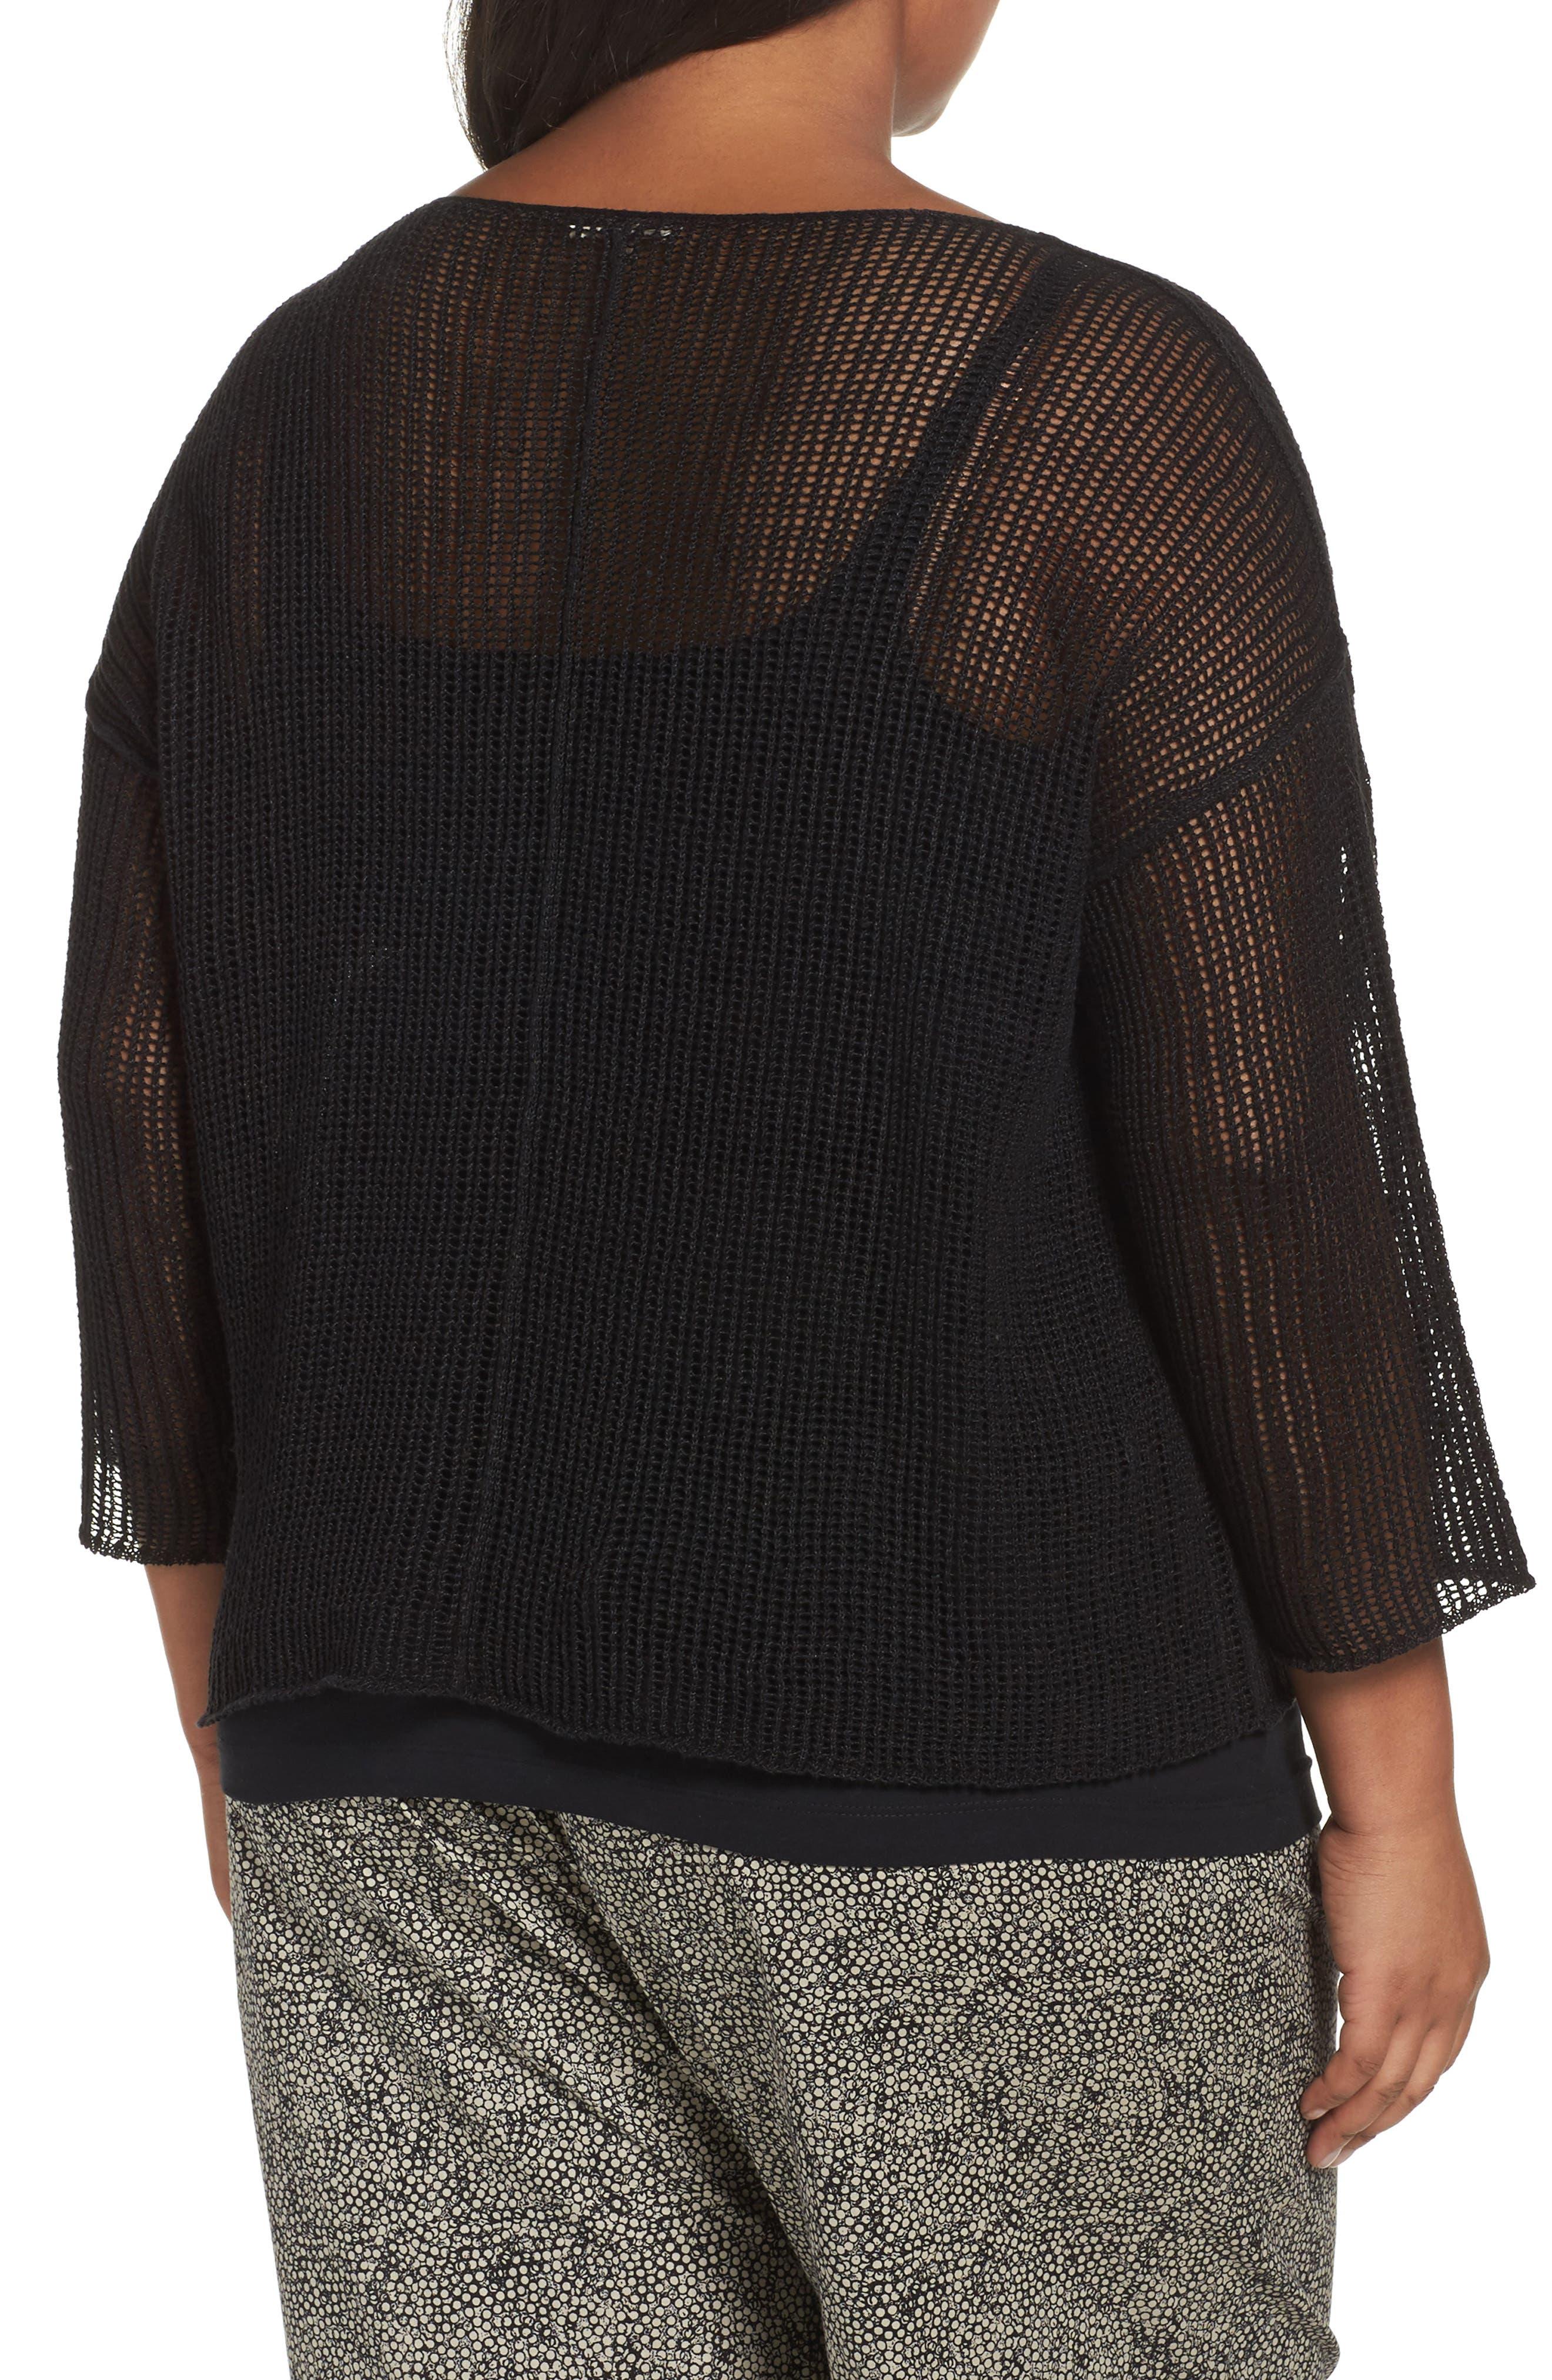 Alternate Image 2  - Eileen Fisher Organic Linen Mesh Knit Top (Plus Size)